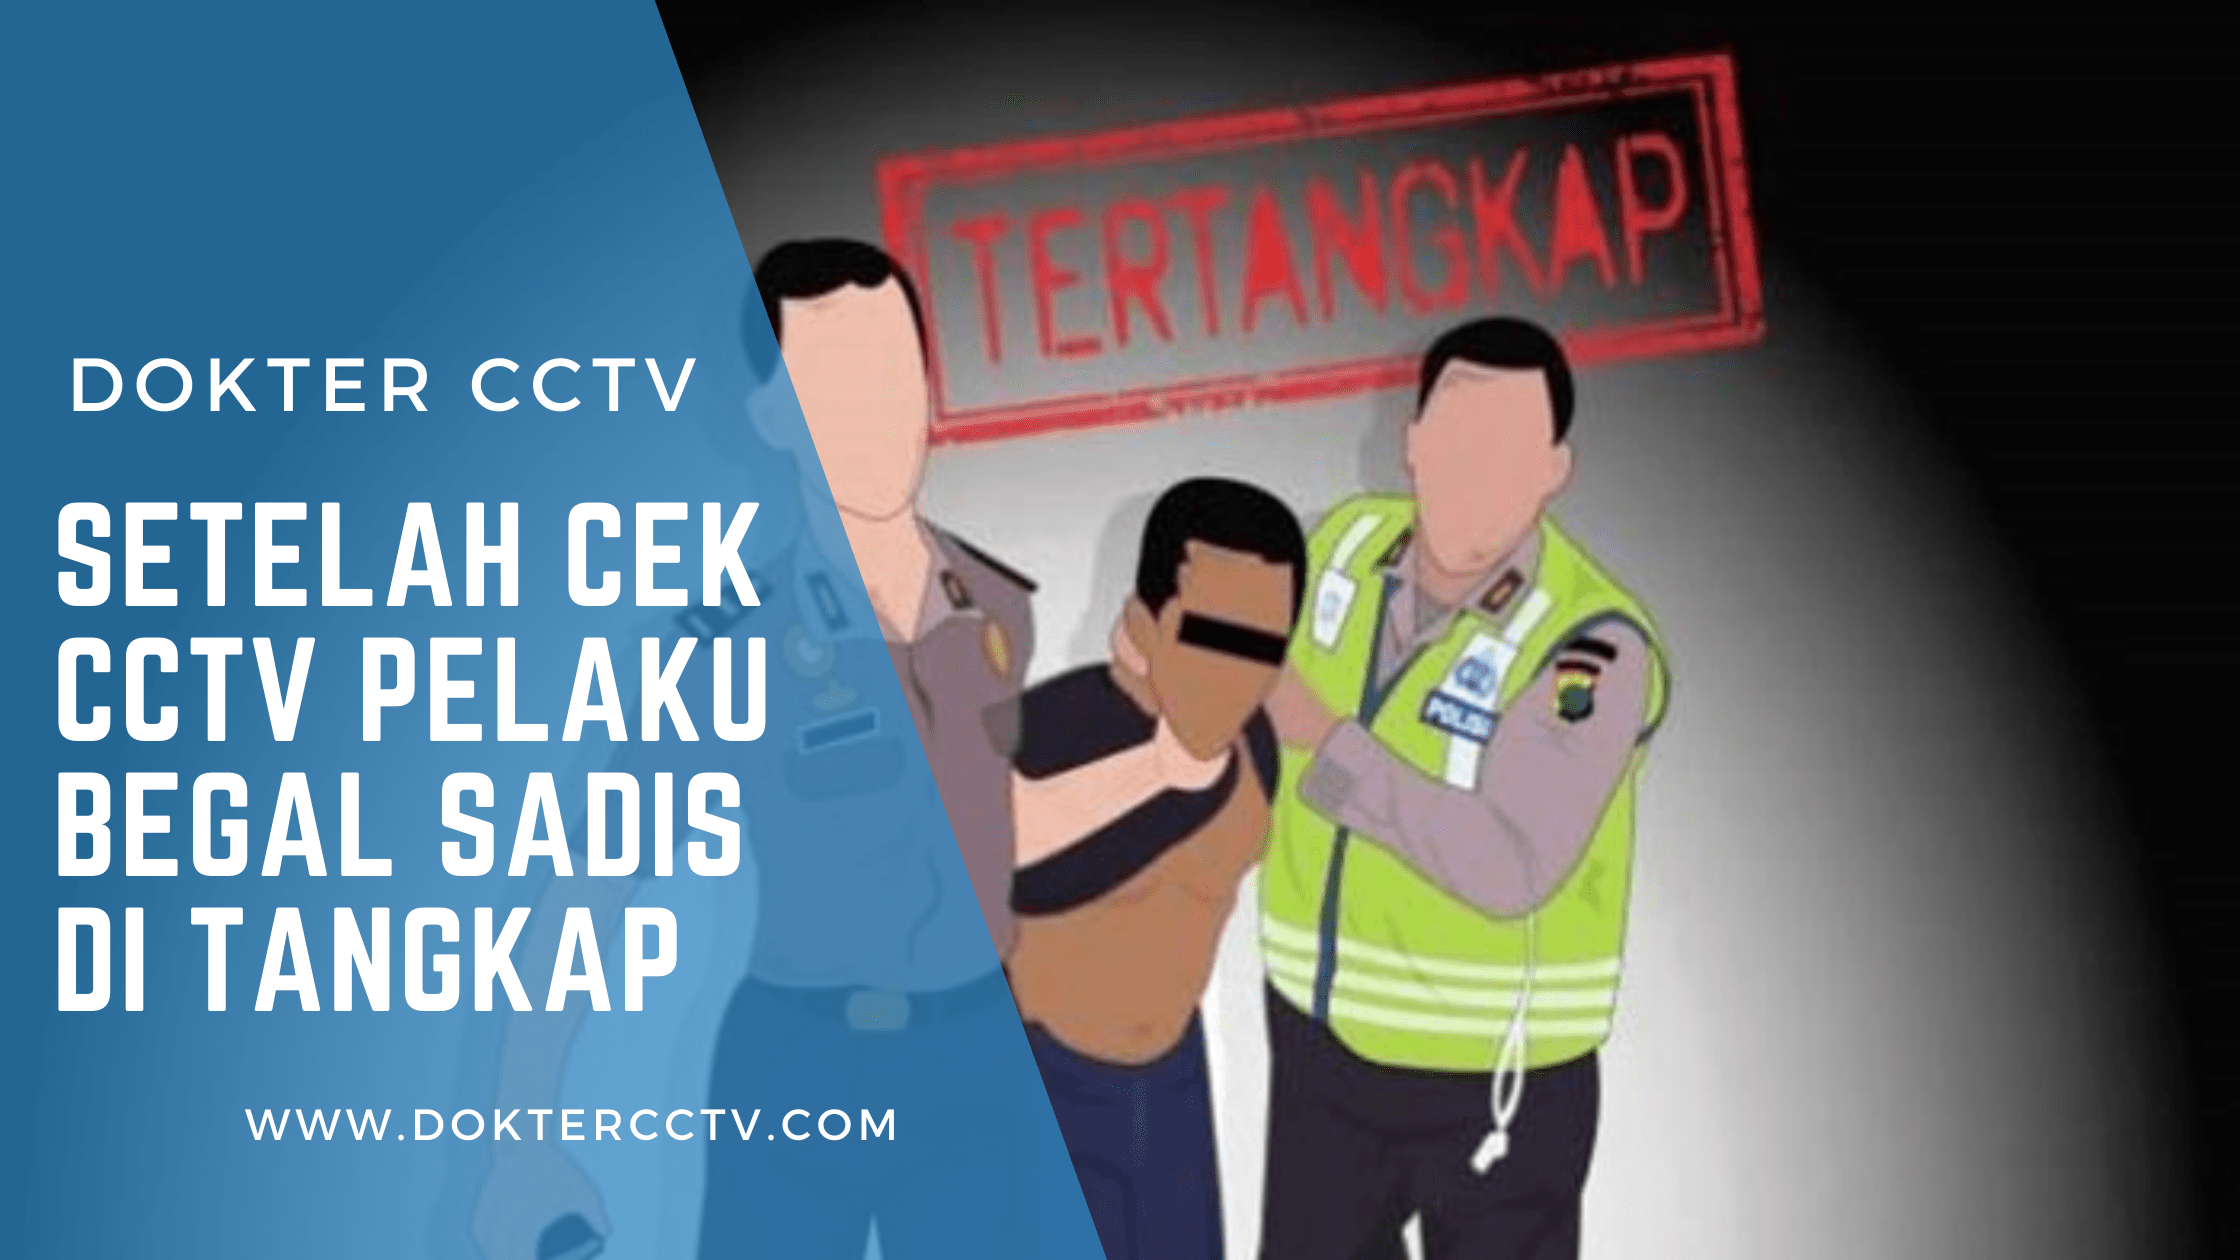 Setelah Cek CCTV Pelaku Begal Sadis di Tangkap